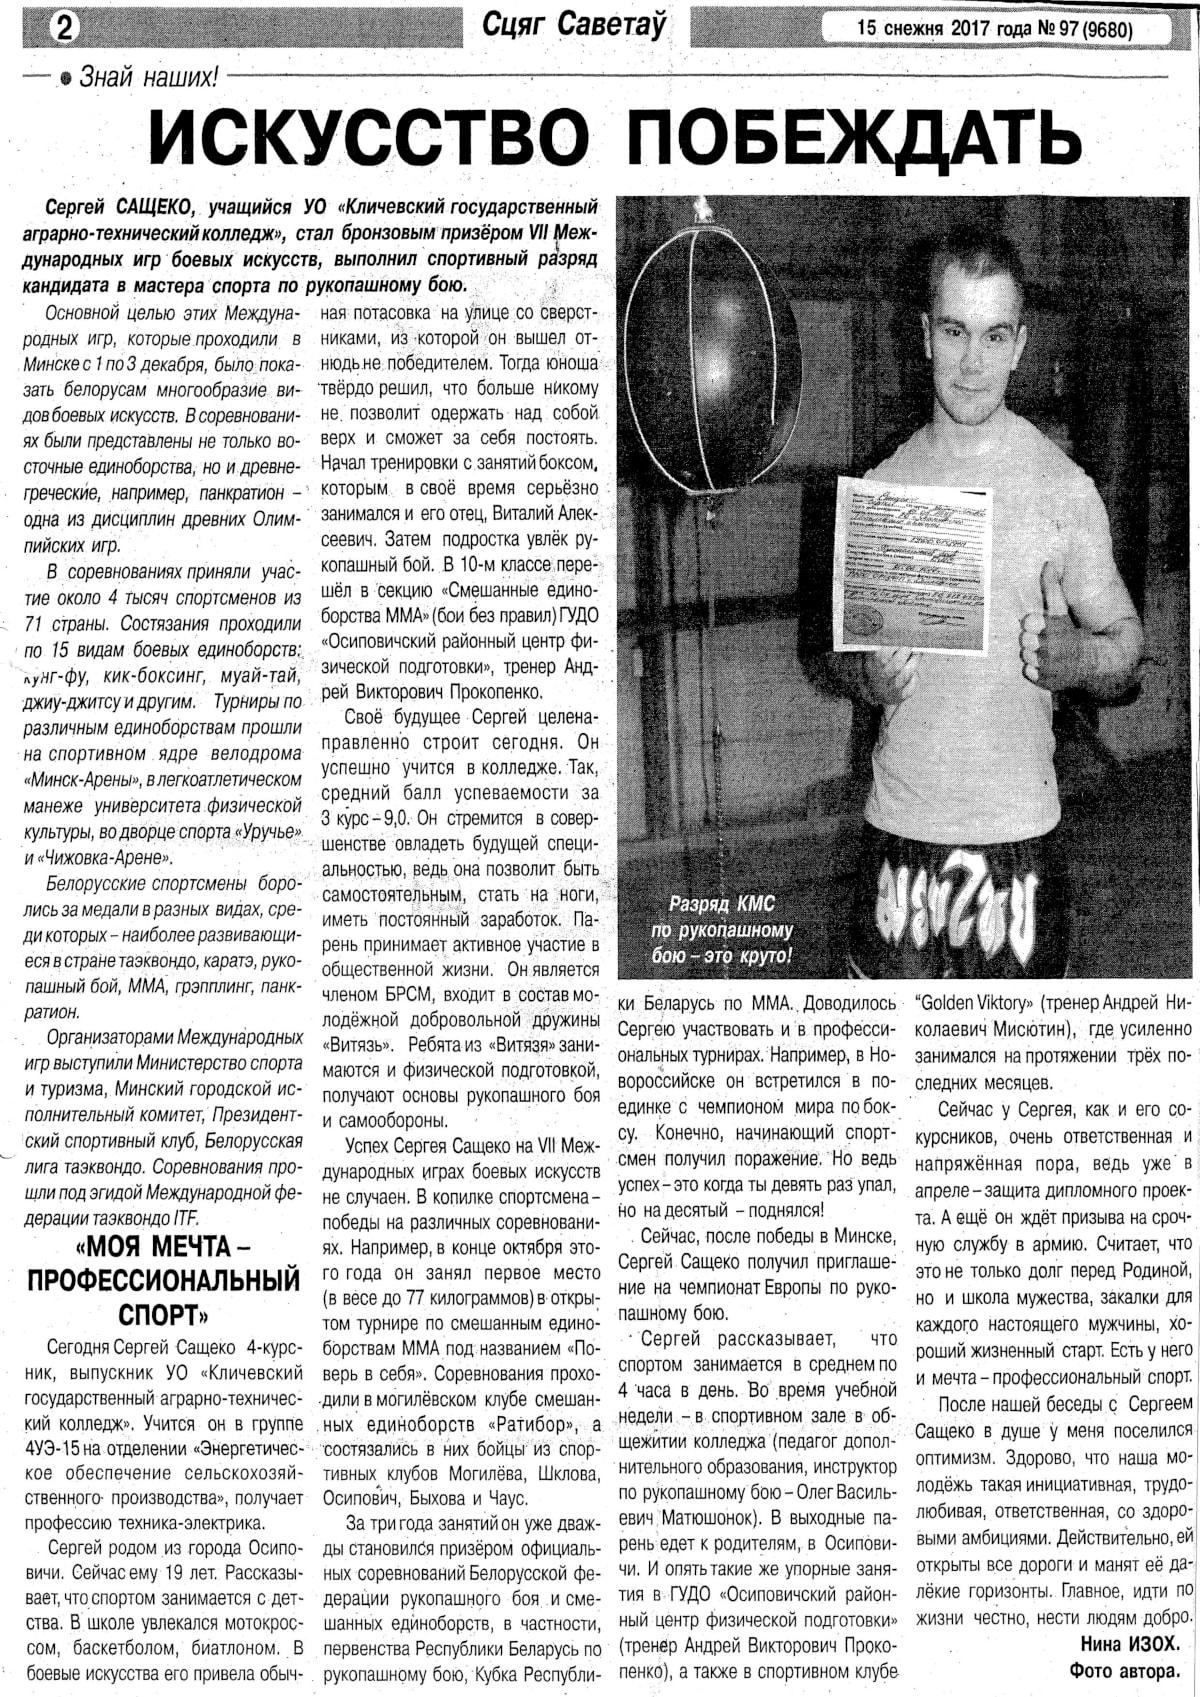 Сергей Сащенко КГАТК